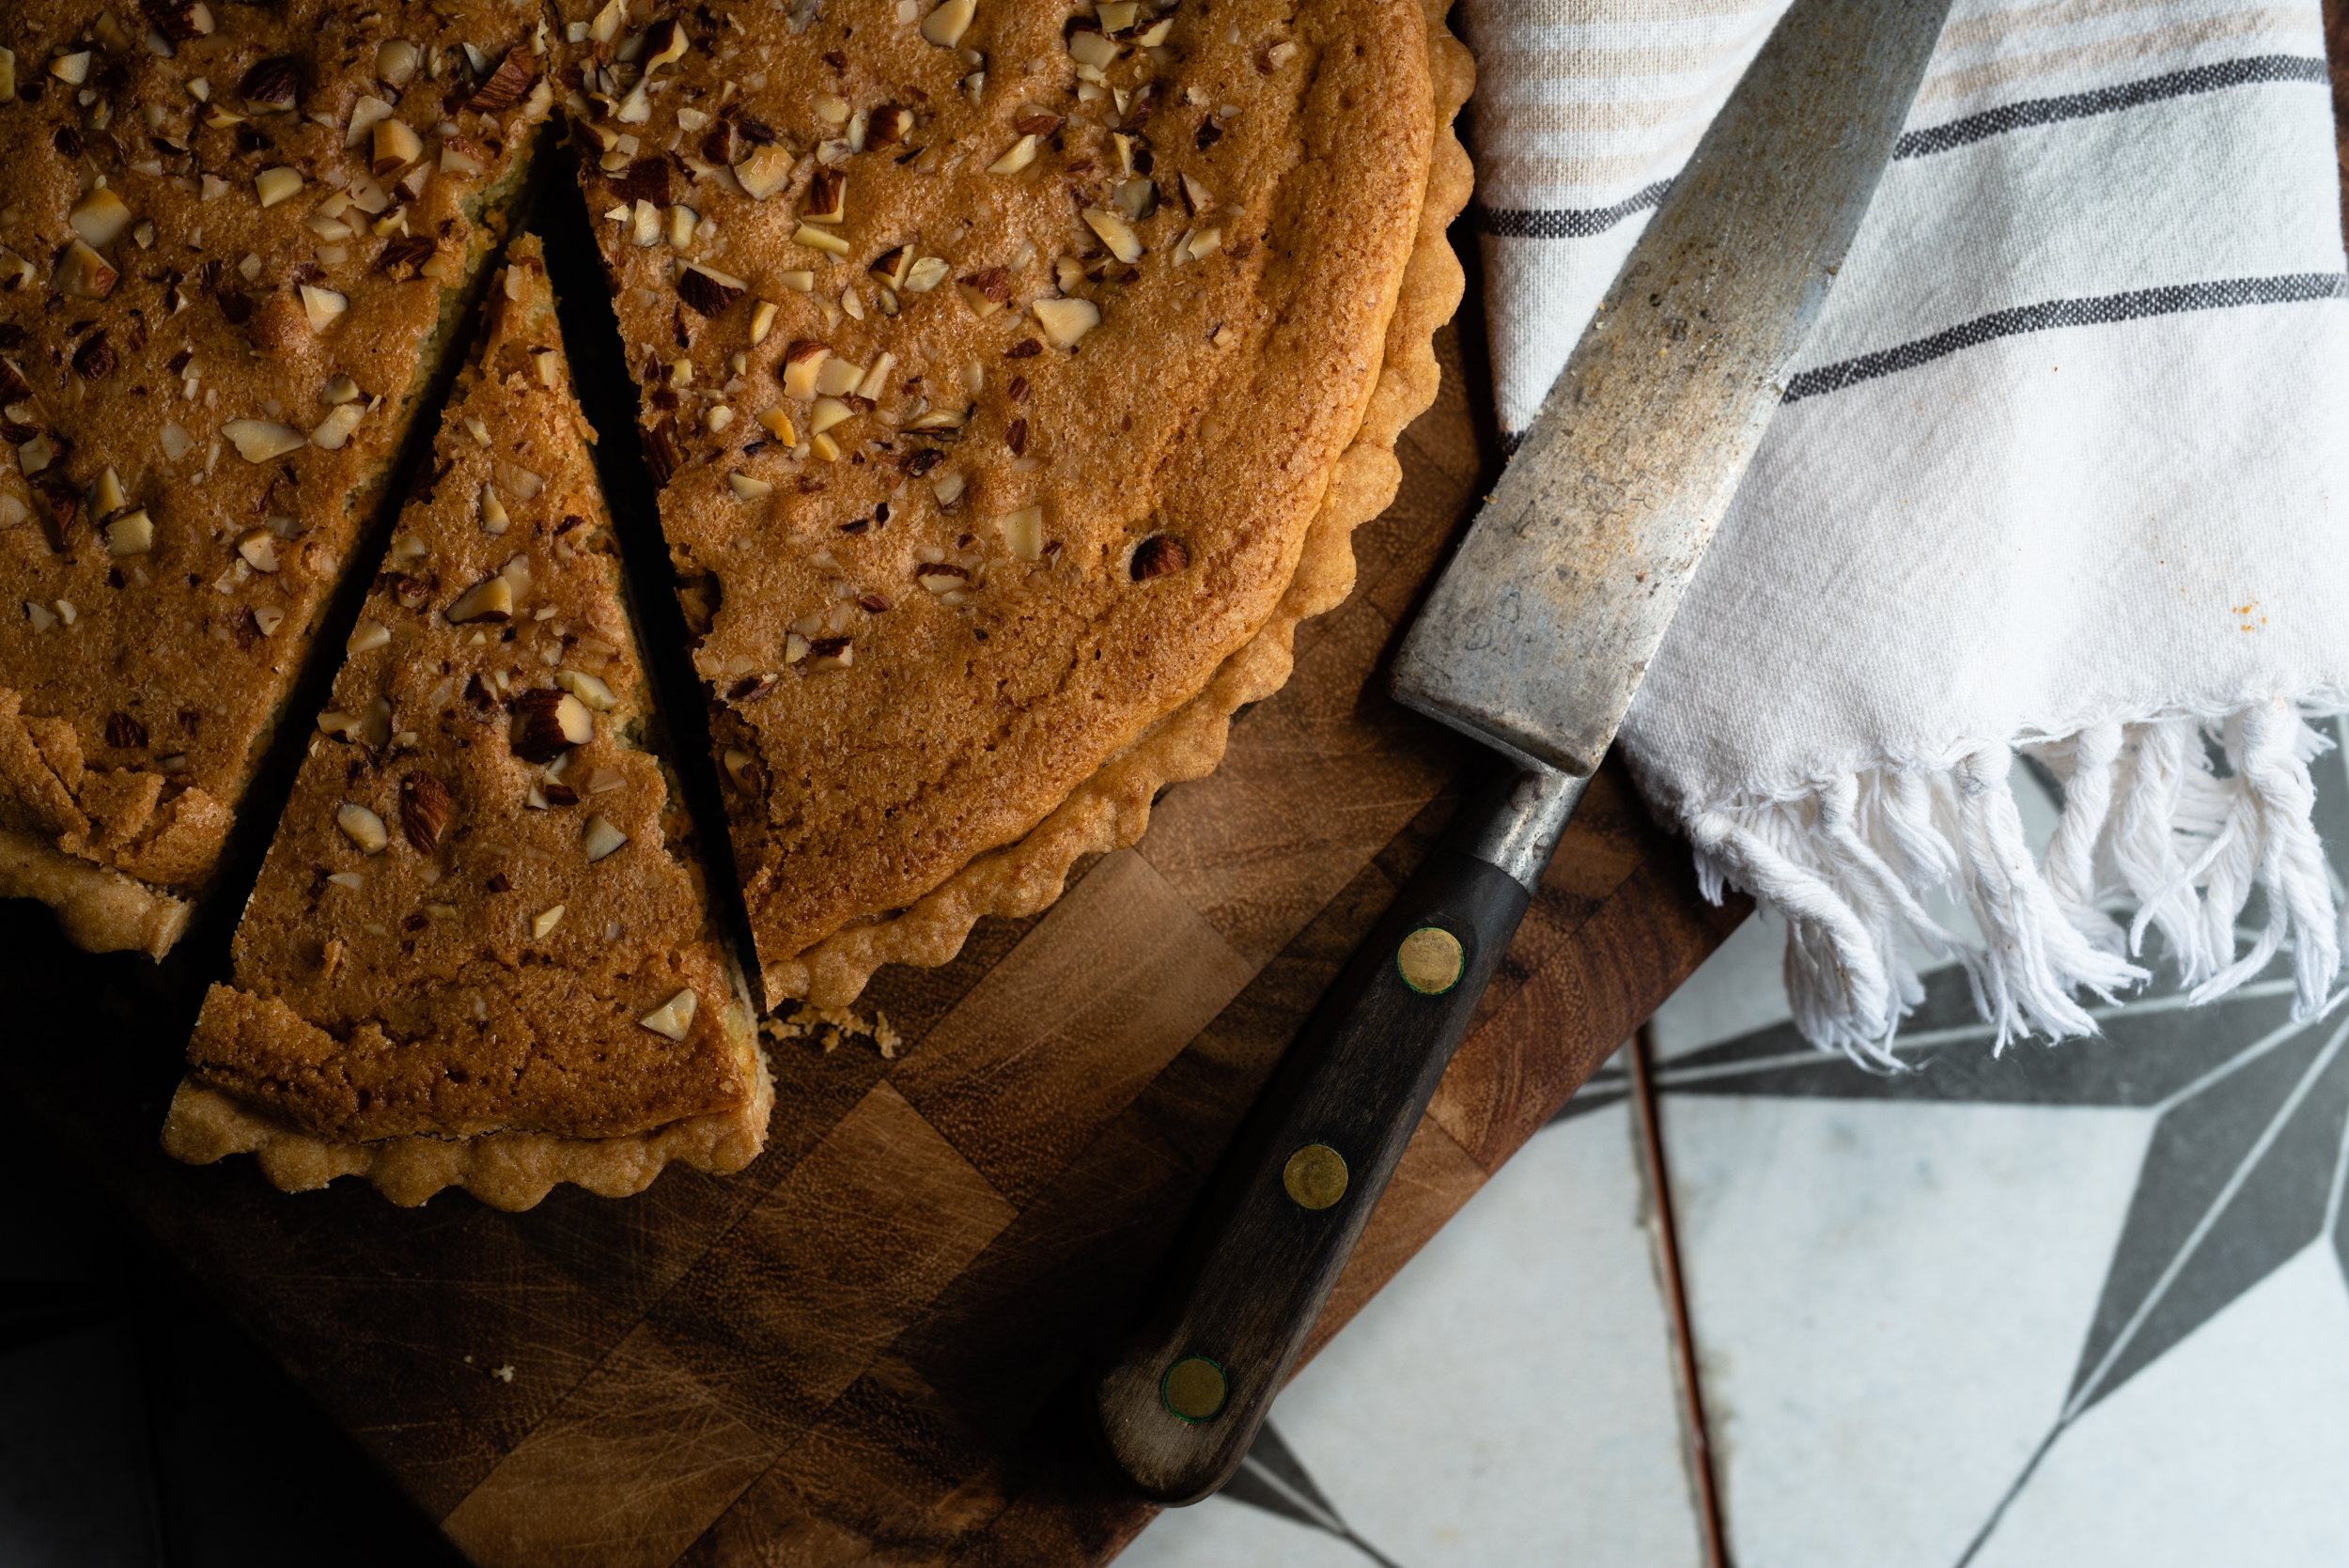 David_Benthal_Photography_Barrow_Food_House (7 of 16).jpg